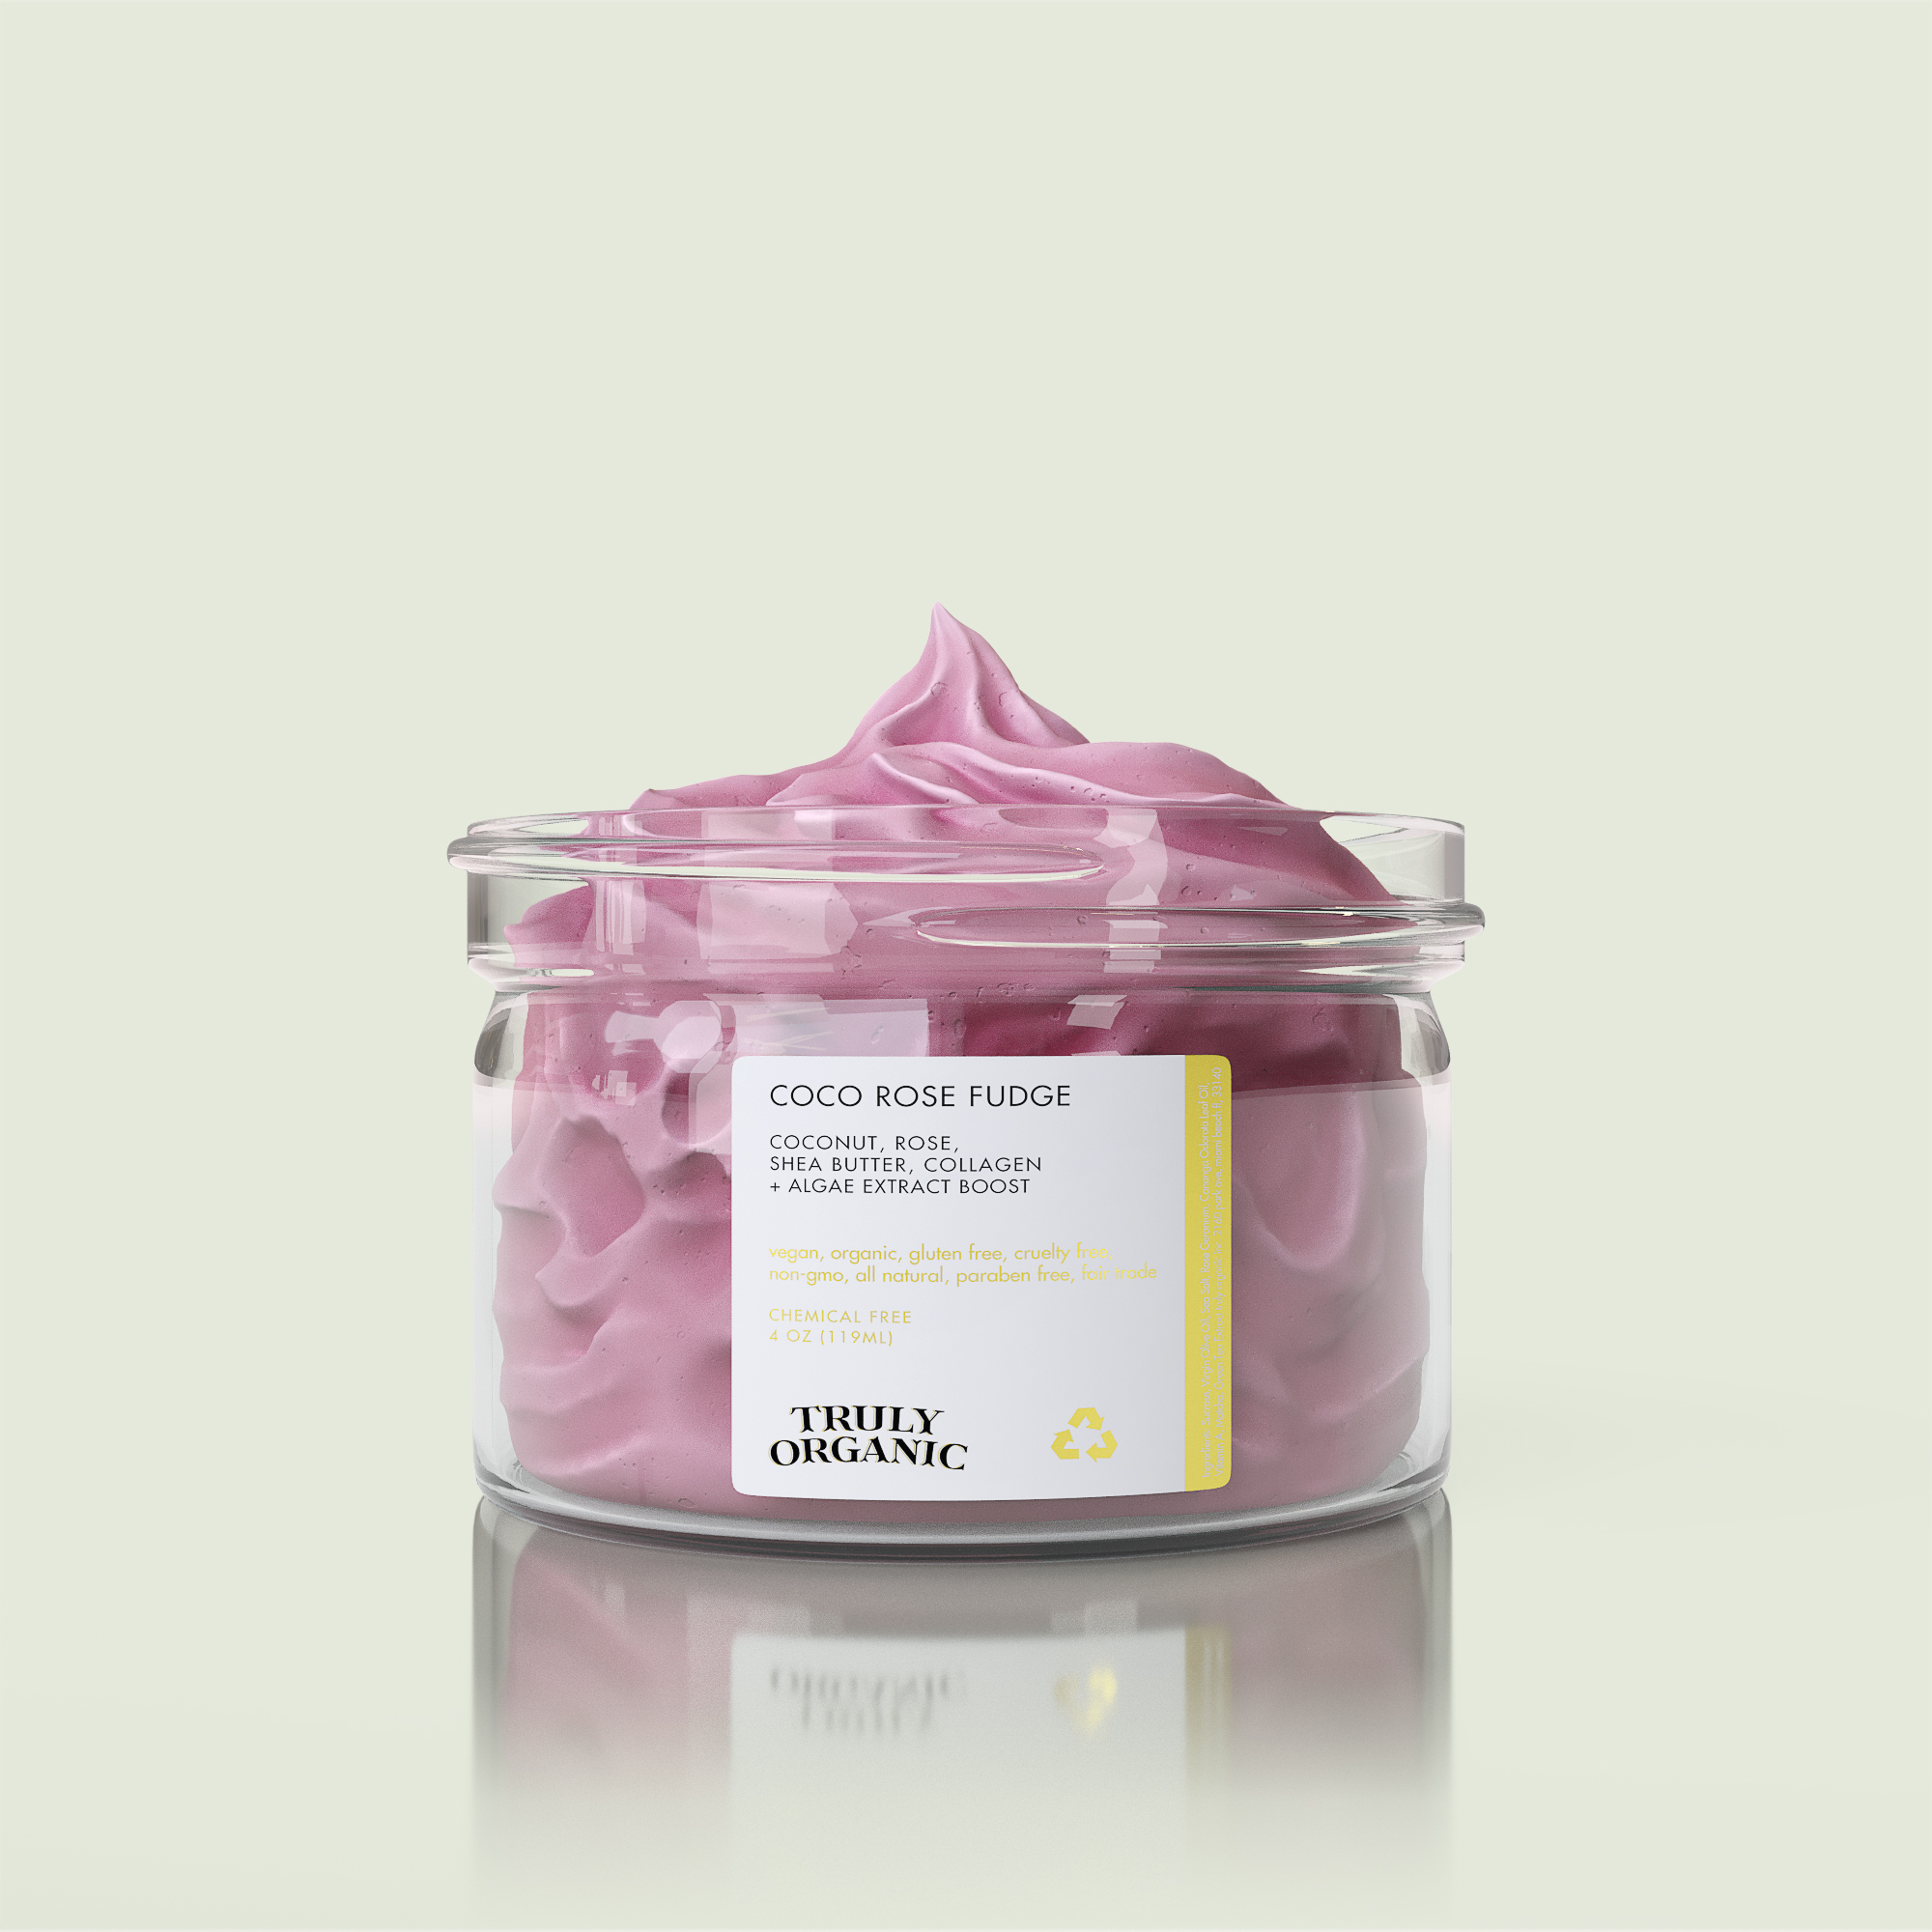 Truly Organic - Coco Rose Fudge Body Butter